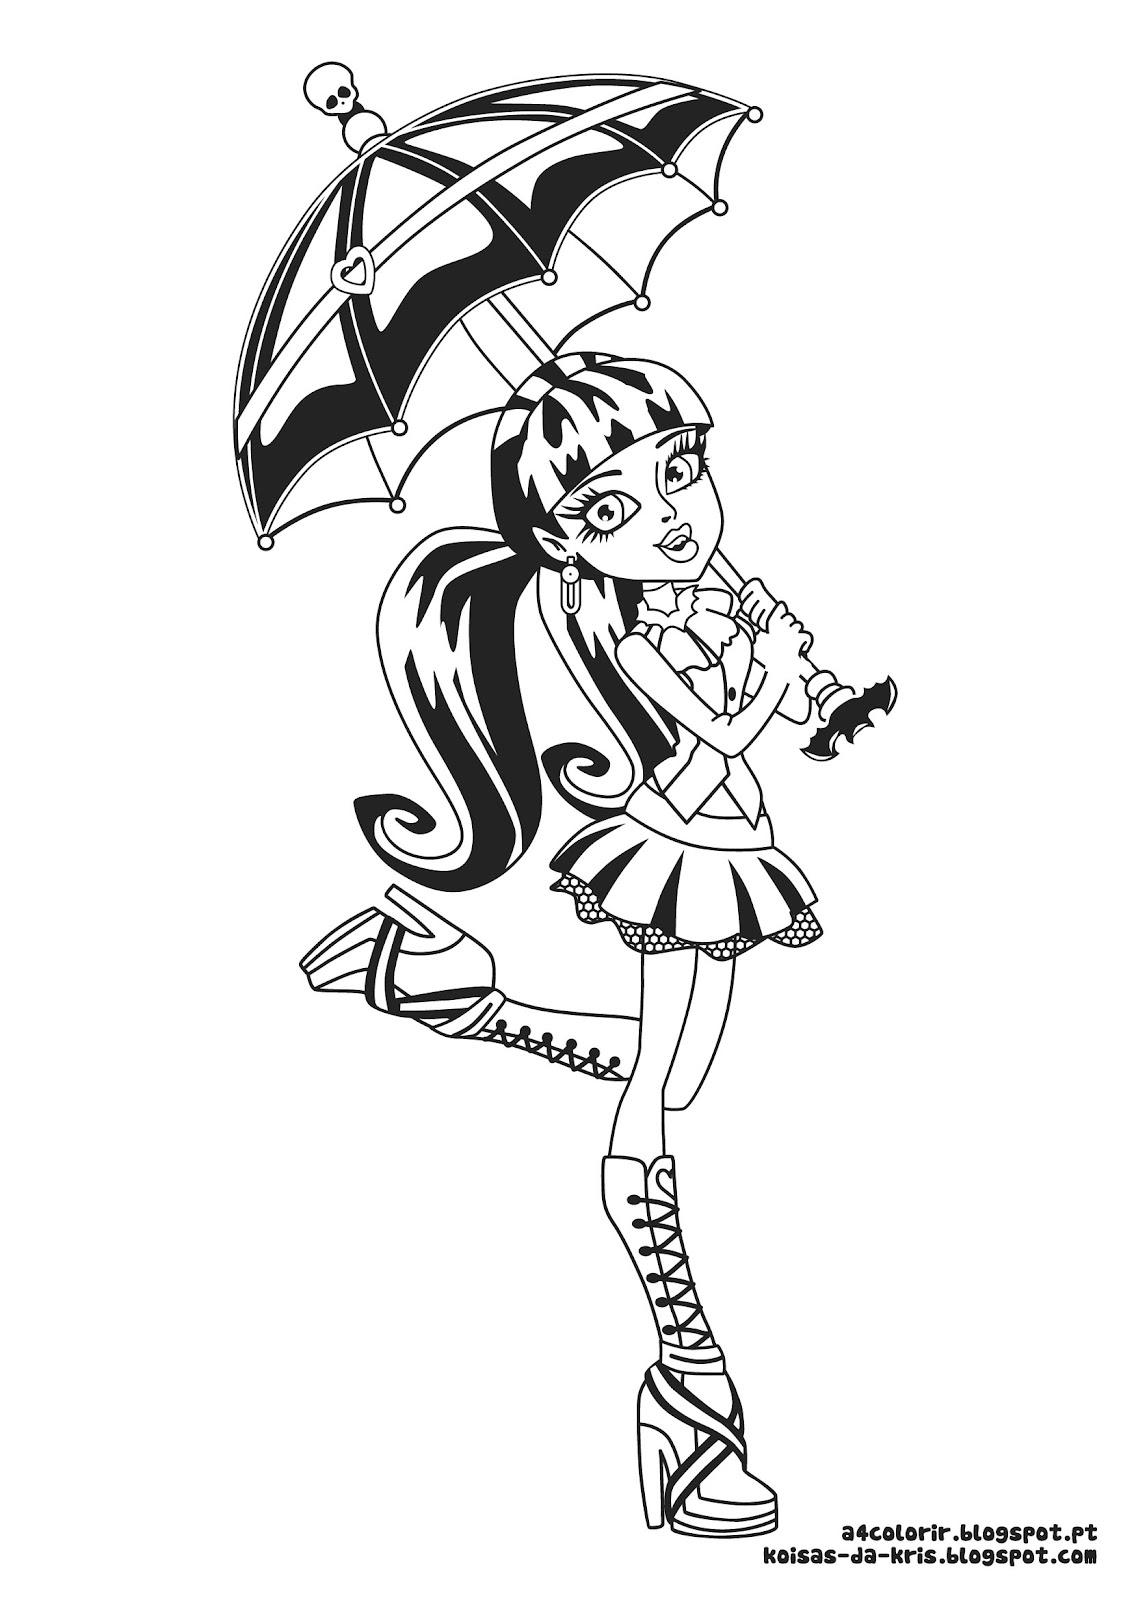 Desenhos de Monster High para colorir , jogos de pintar